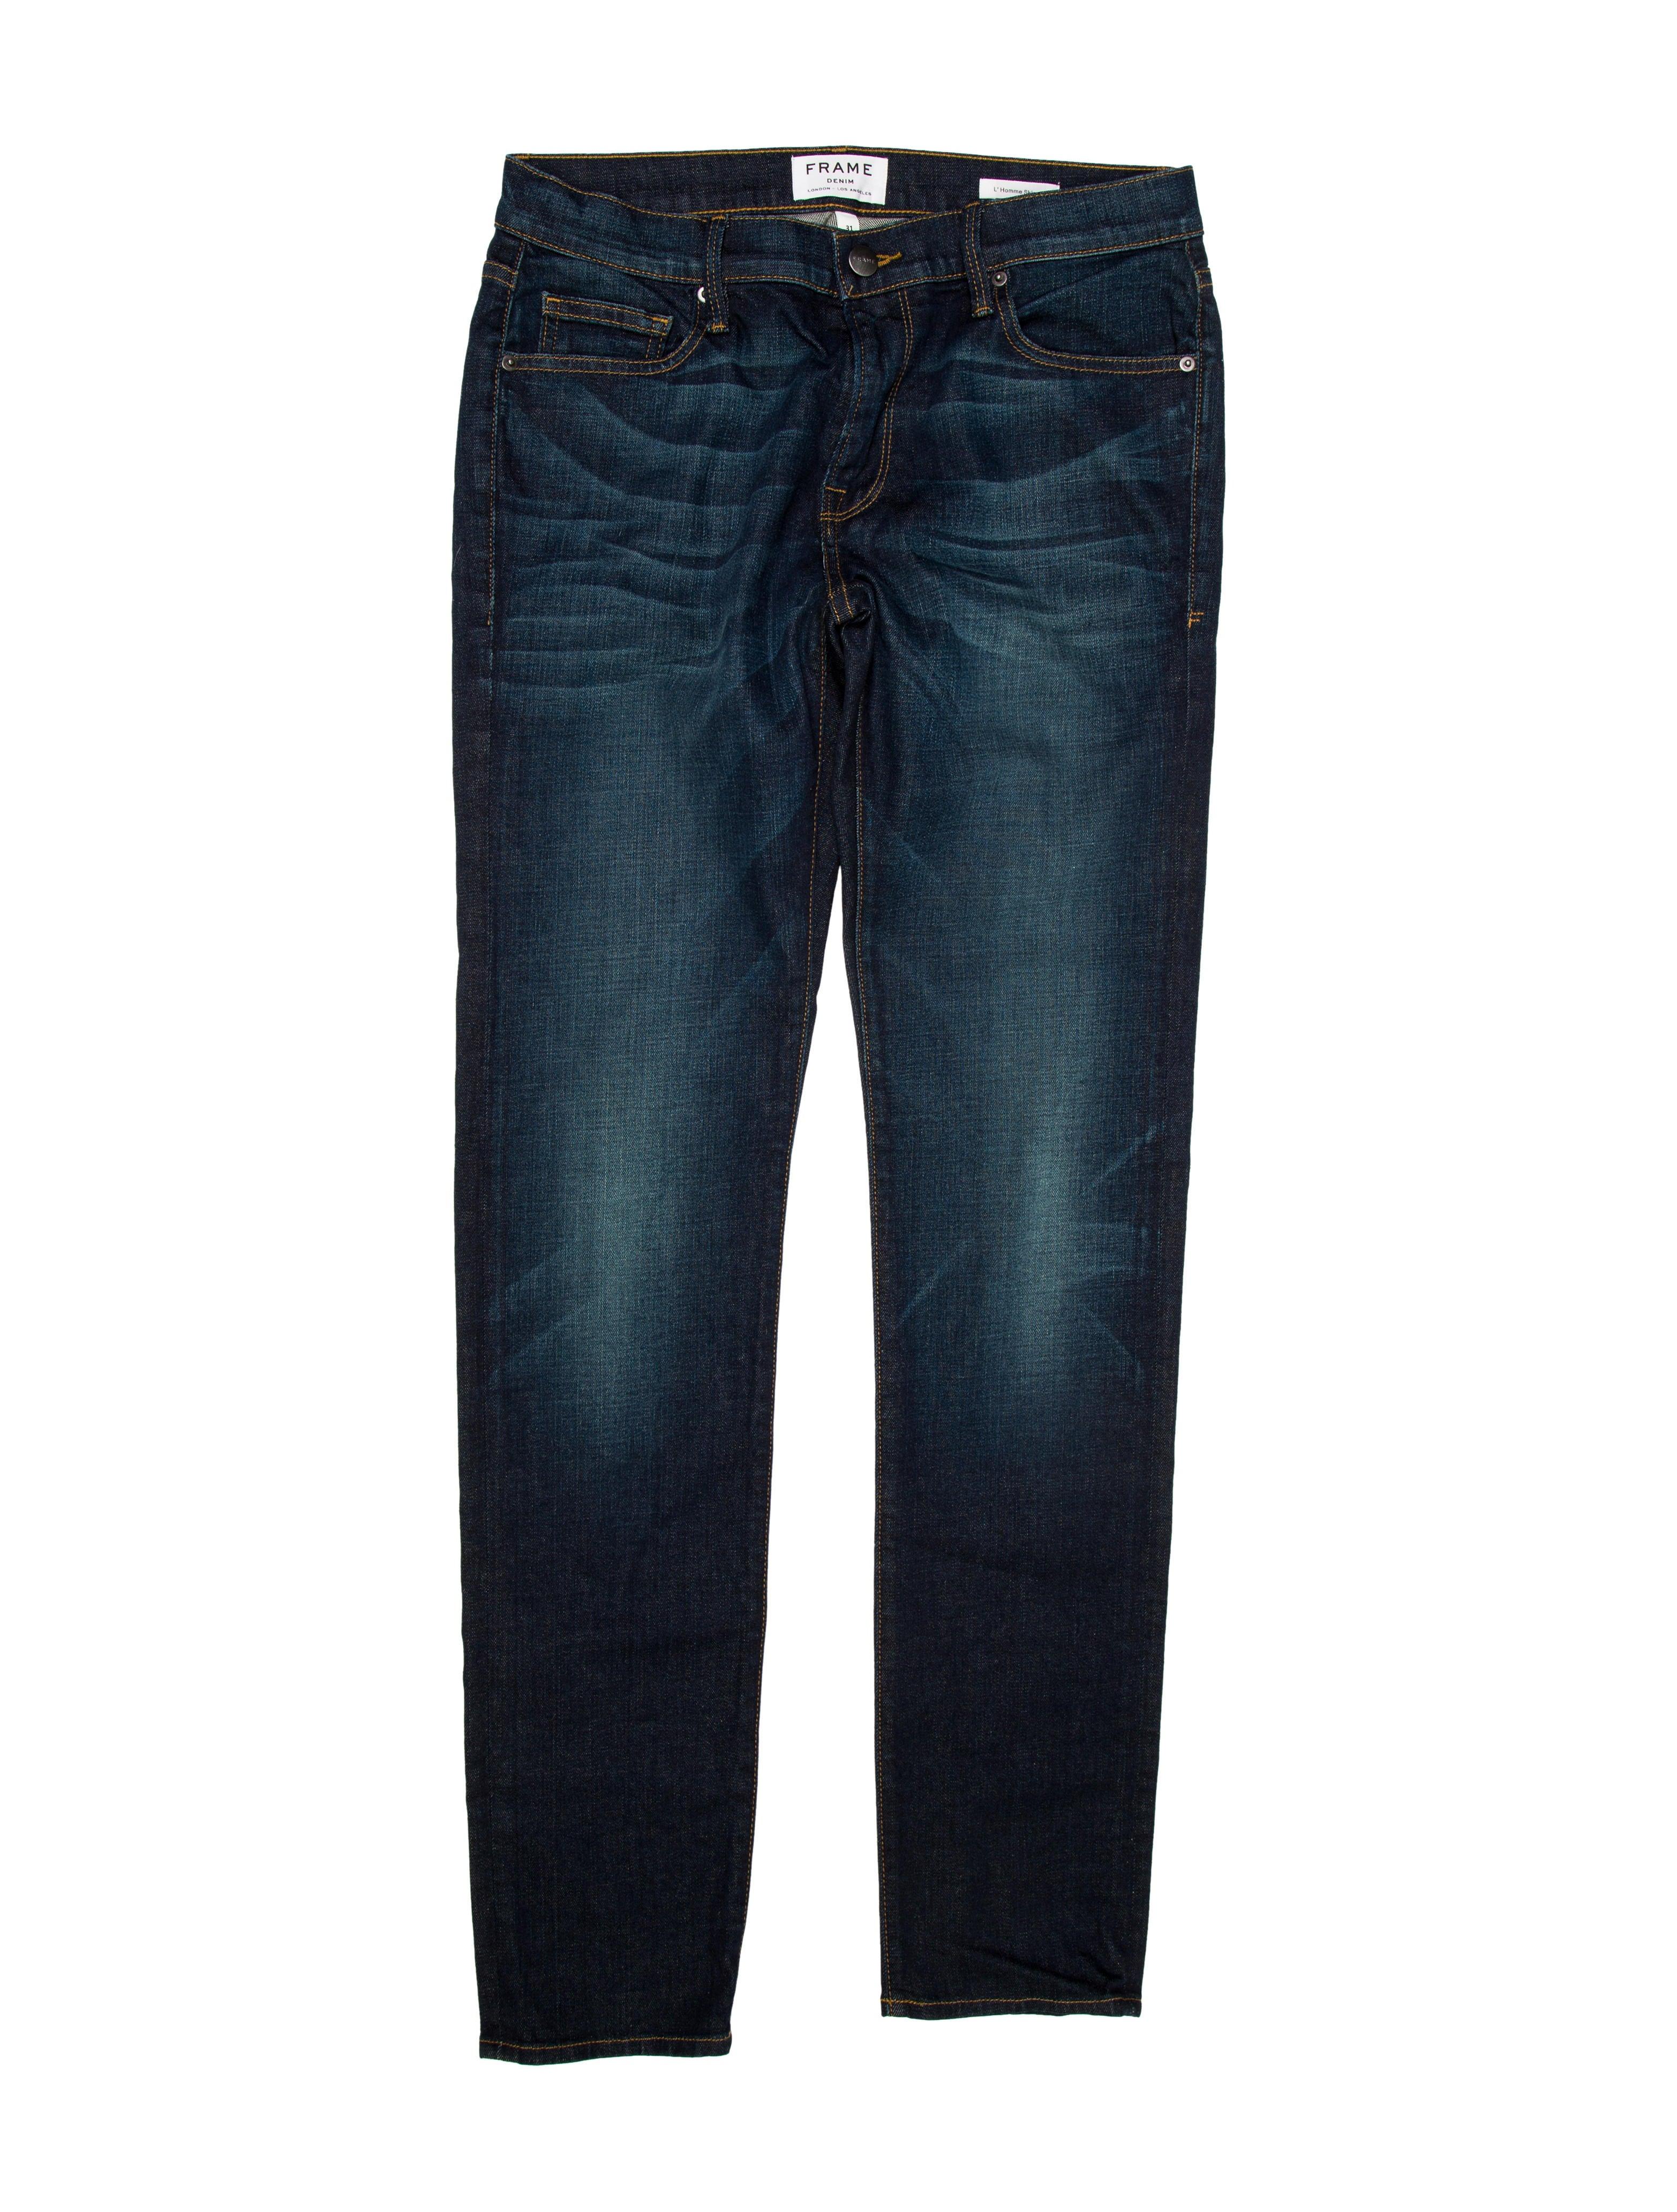 frame denim l 39 homme skinny jeans clothing wfd28247 the realreal. Black Bedroom Furniture Sets. Home Design Ideas